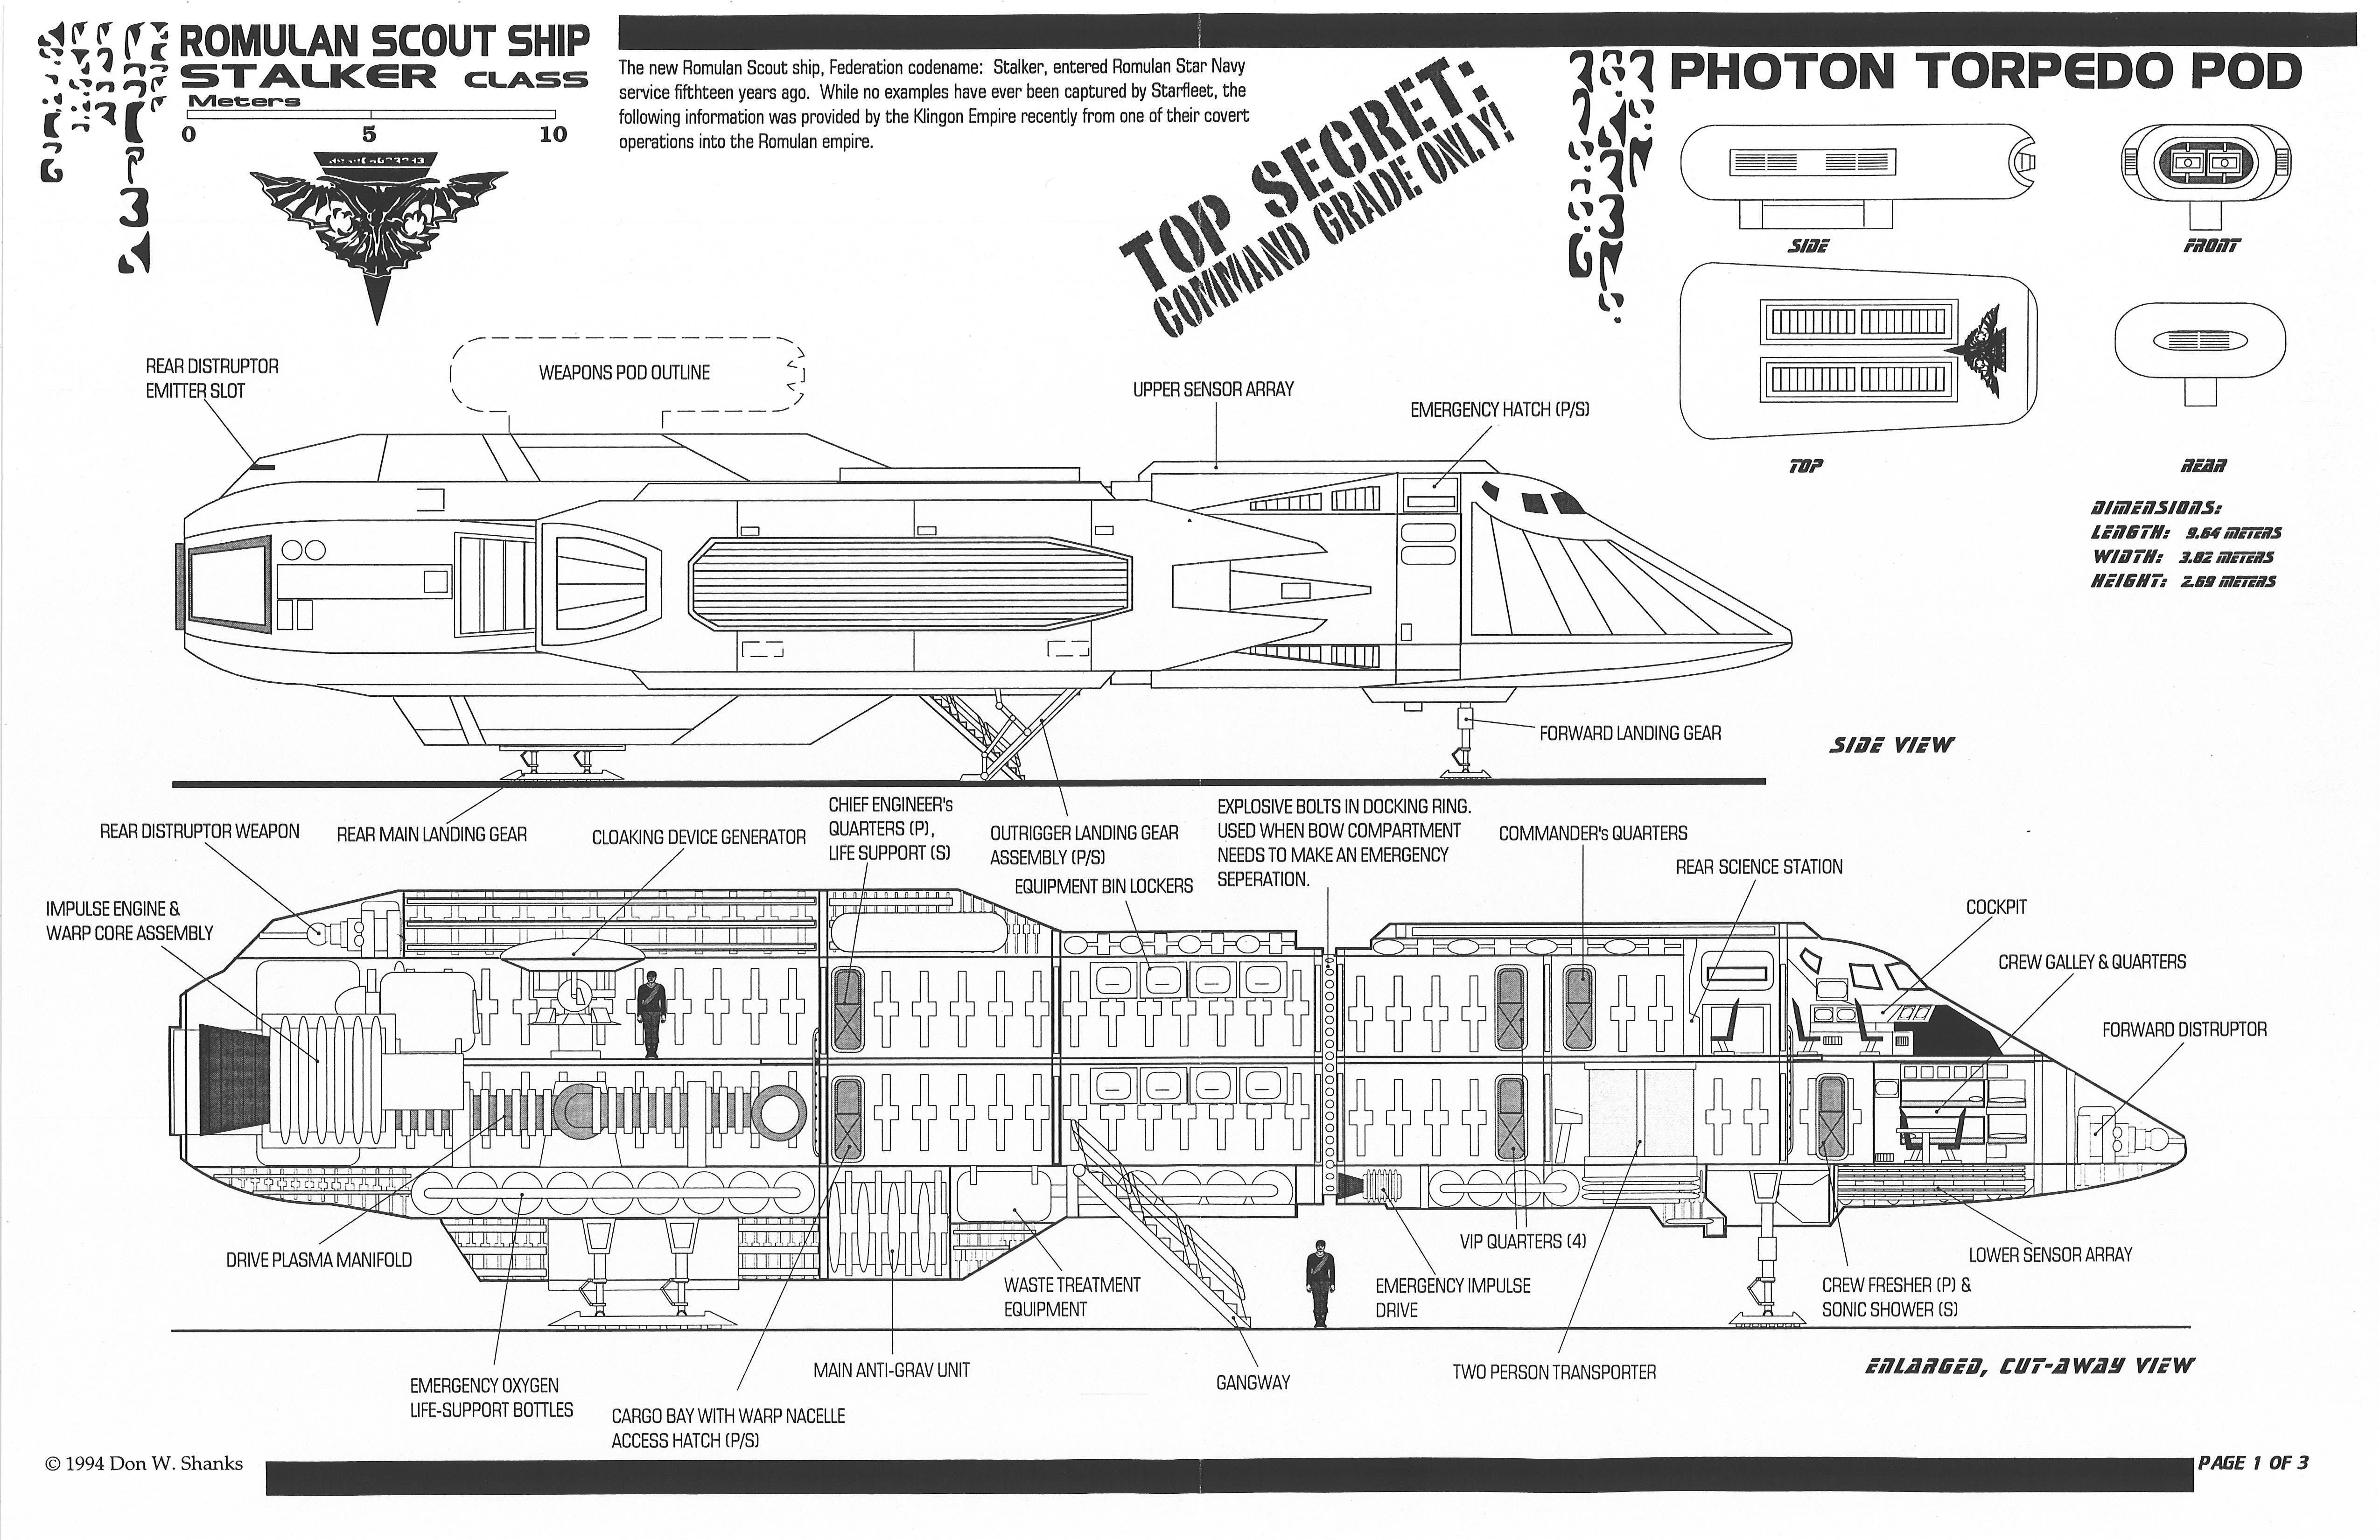 Star Trek 4k Ultra Hd Wallpaper